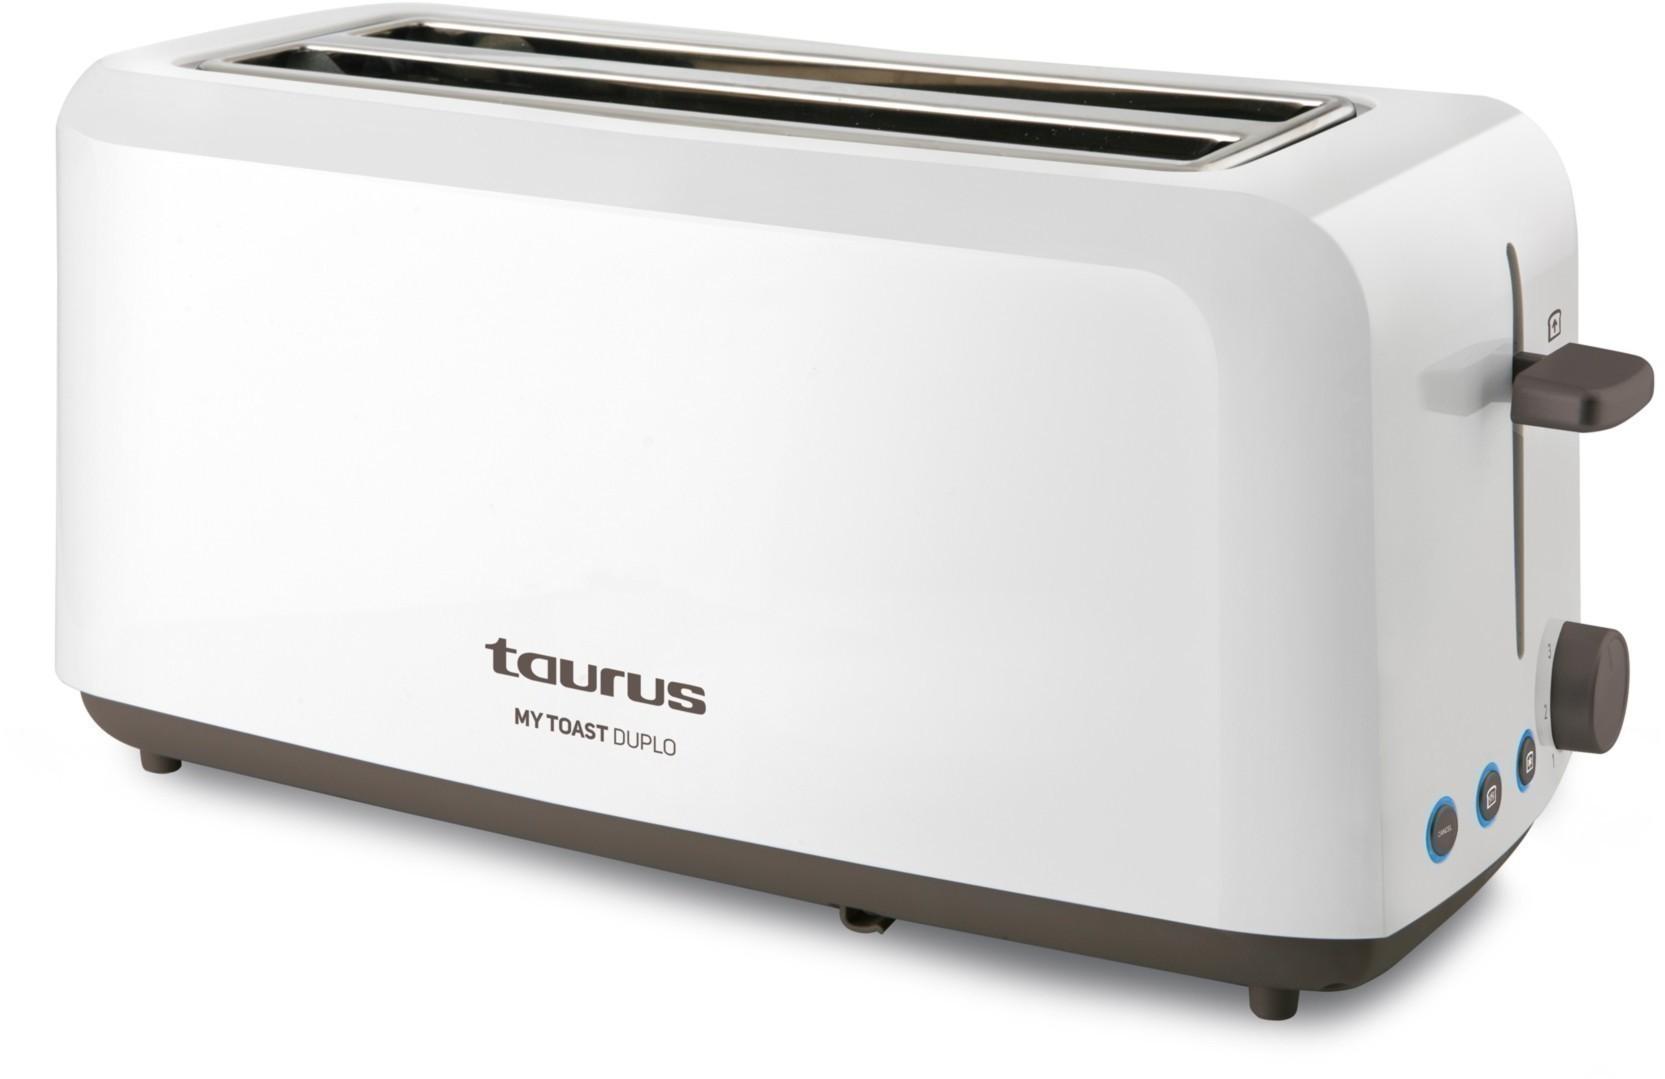 Tostador Taurus MY Toast Duplo 1450w